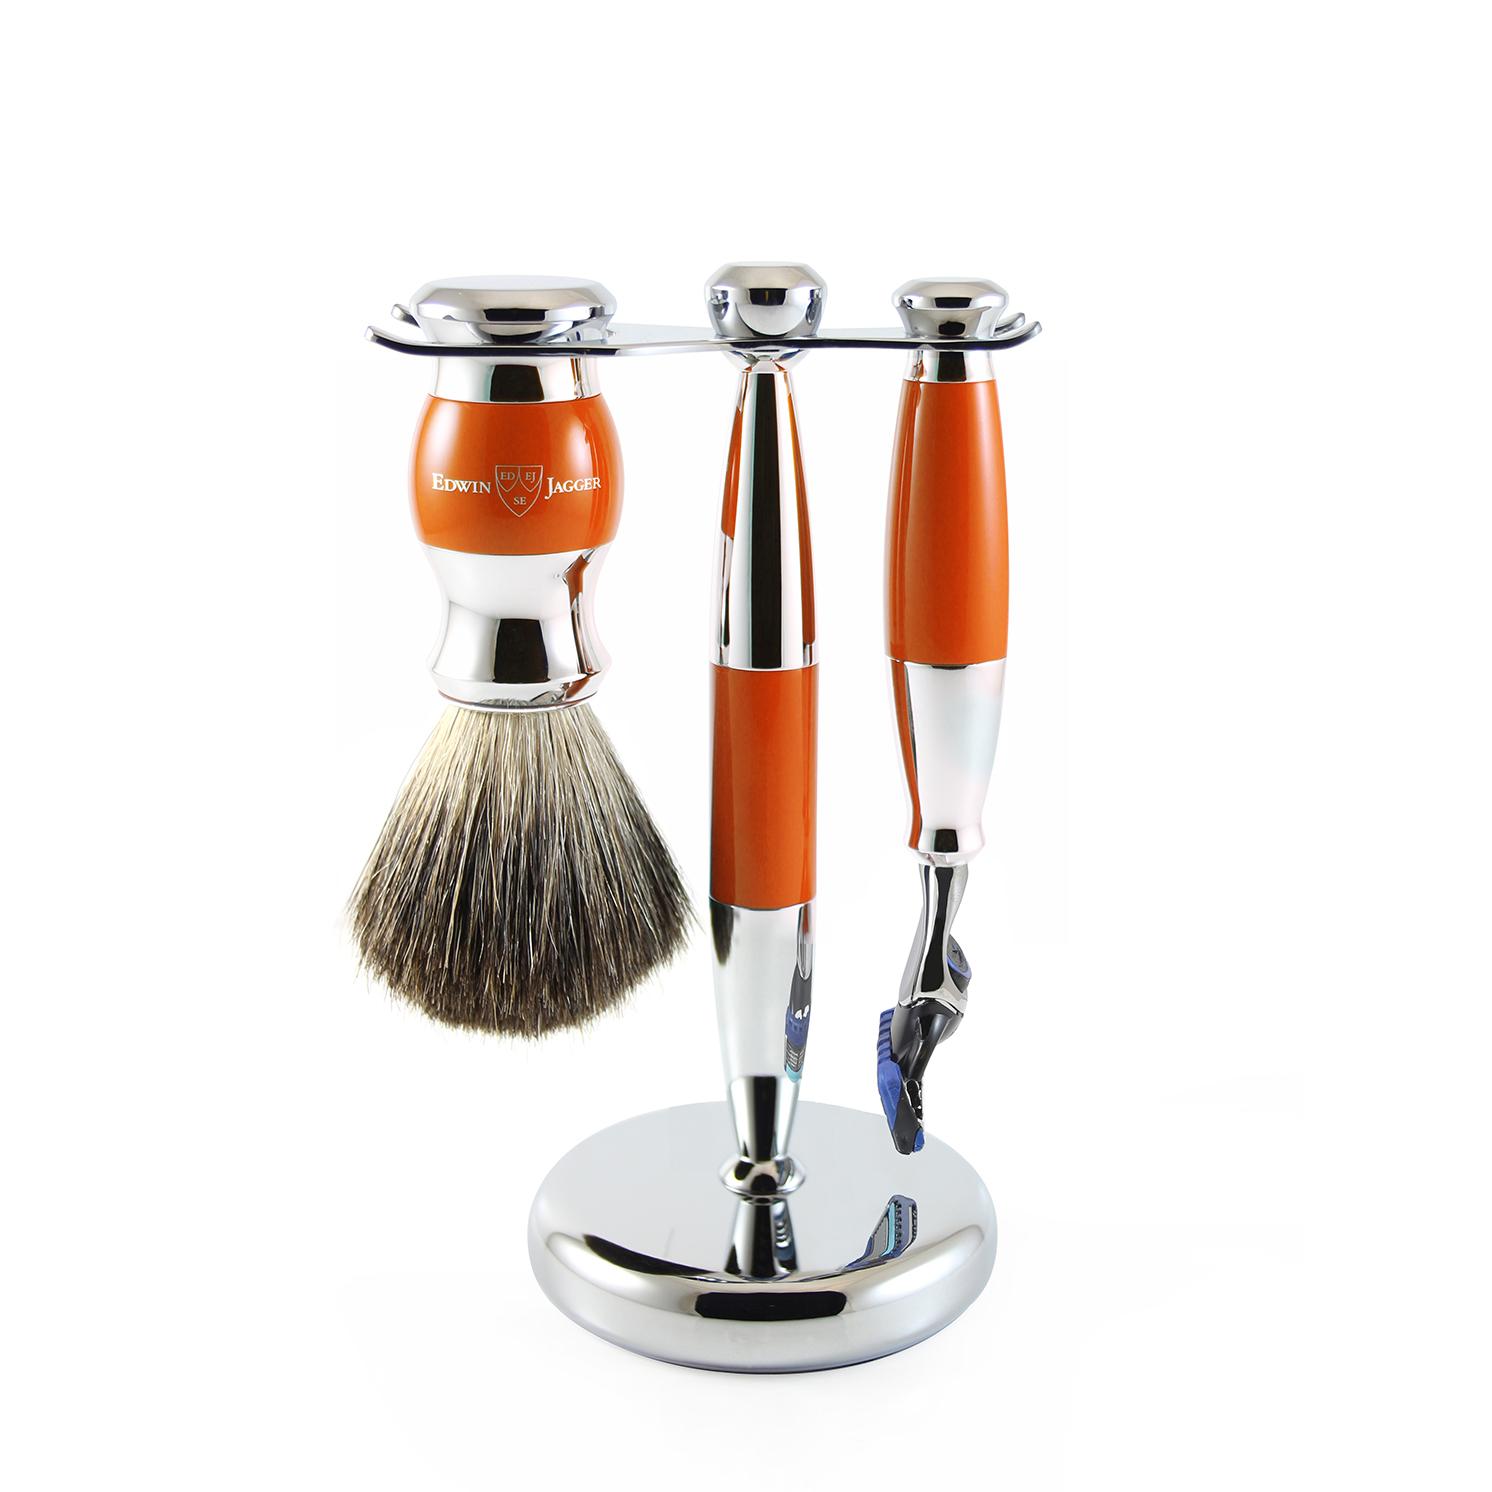 Edwin Jagger – Orange & Chrome 3 Piece Fusion Razor Shaving Set in Gift Box